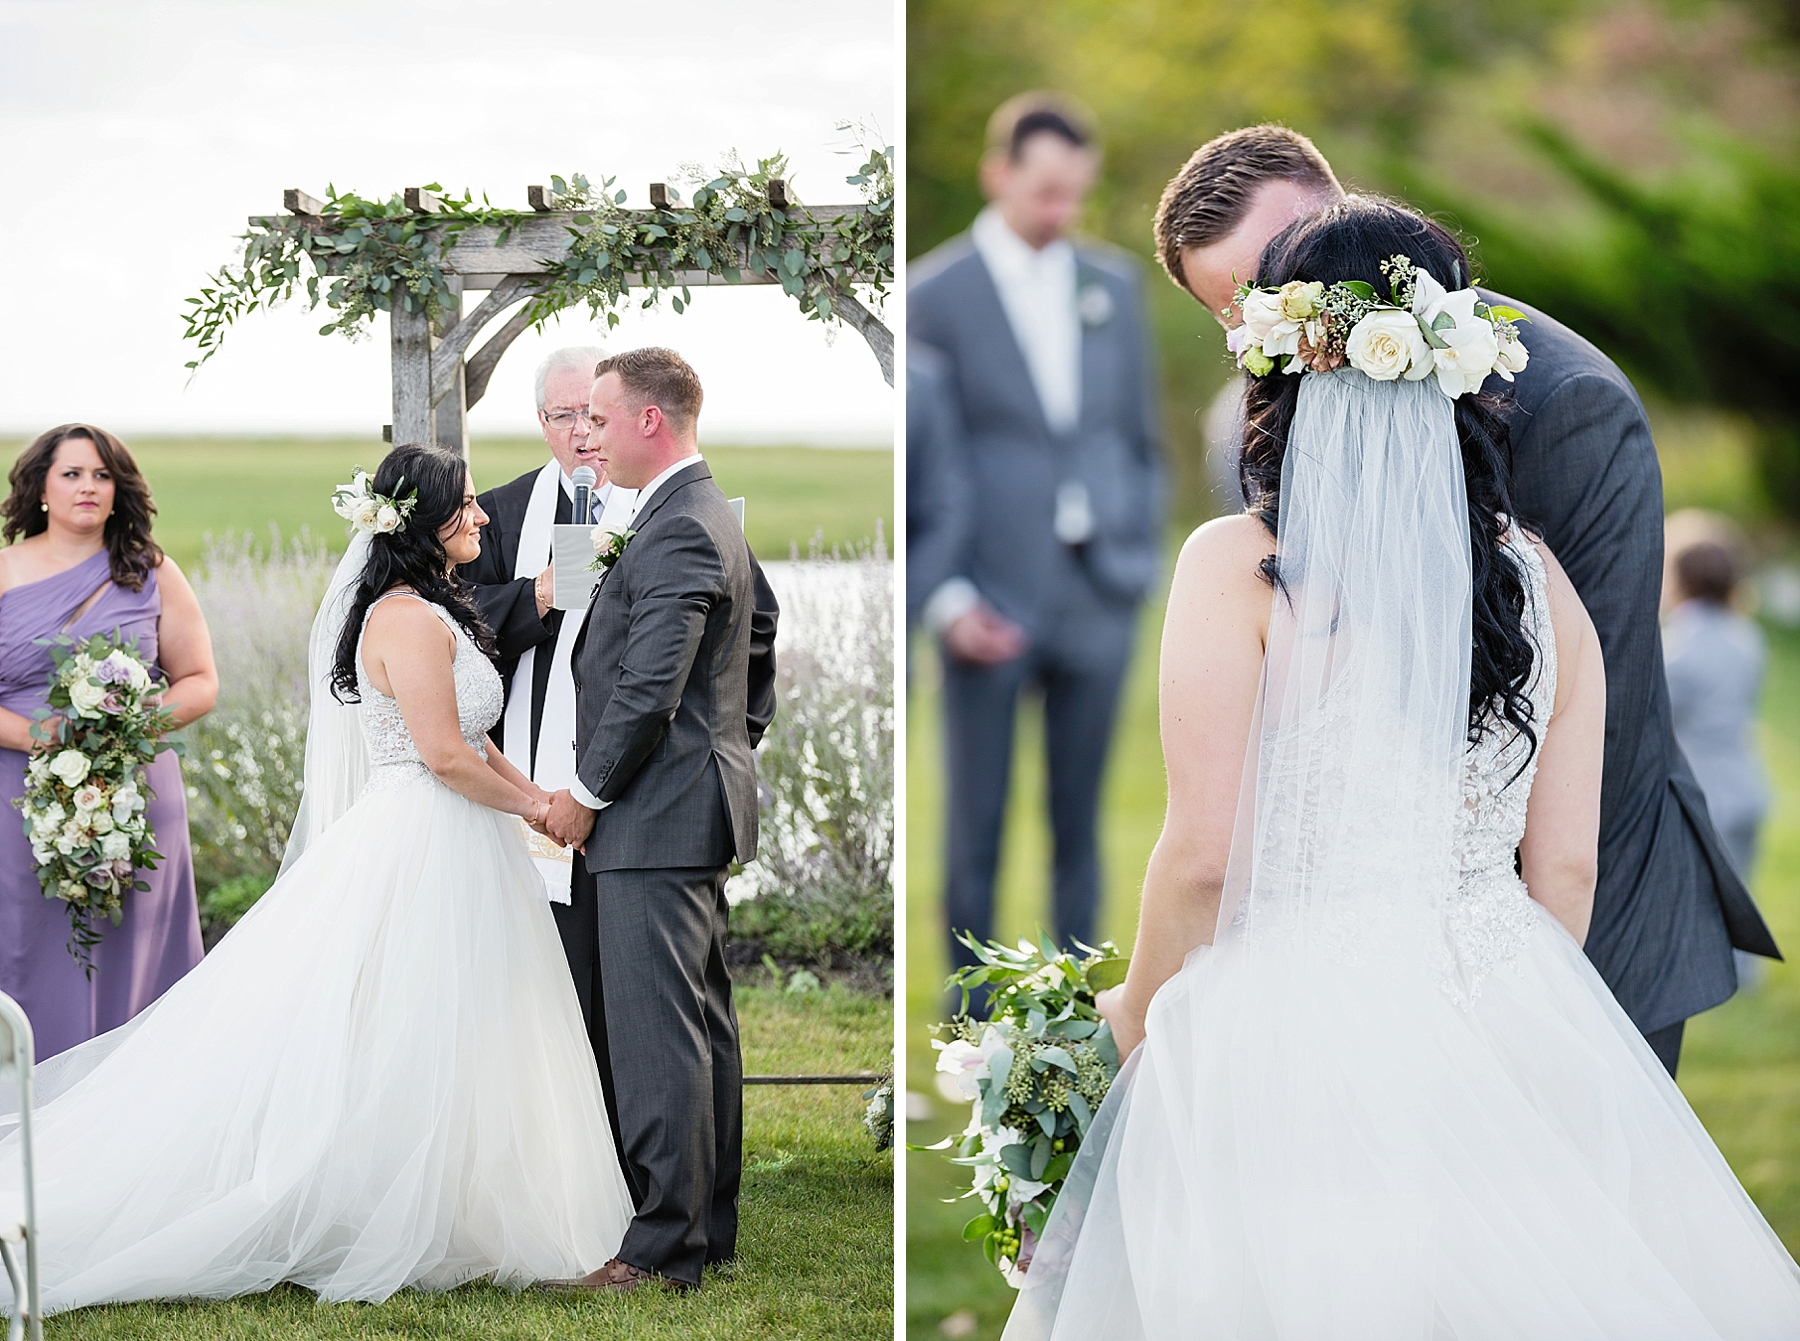 windsor-wedding-photographer-sprucewood-shores-winery-wedding-niagara-on-the-lake-wedding-photographer-eryn-shea-photography_0054.jpg